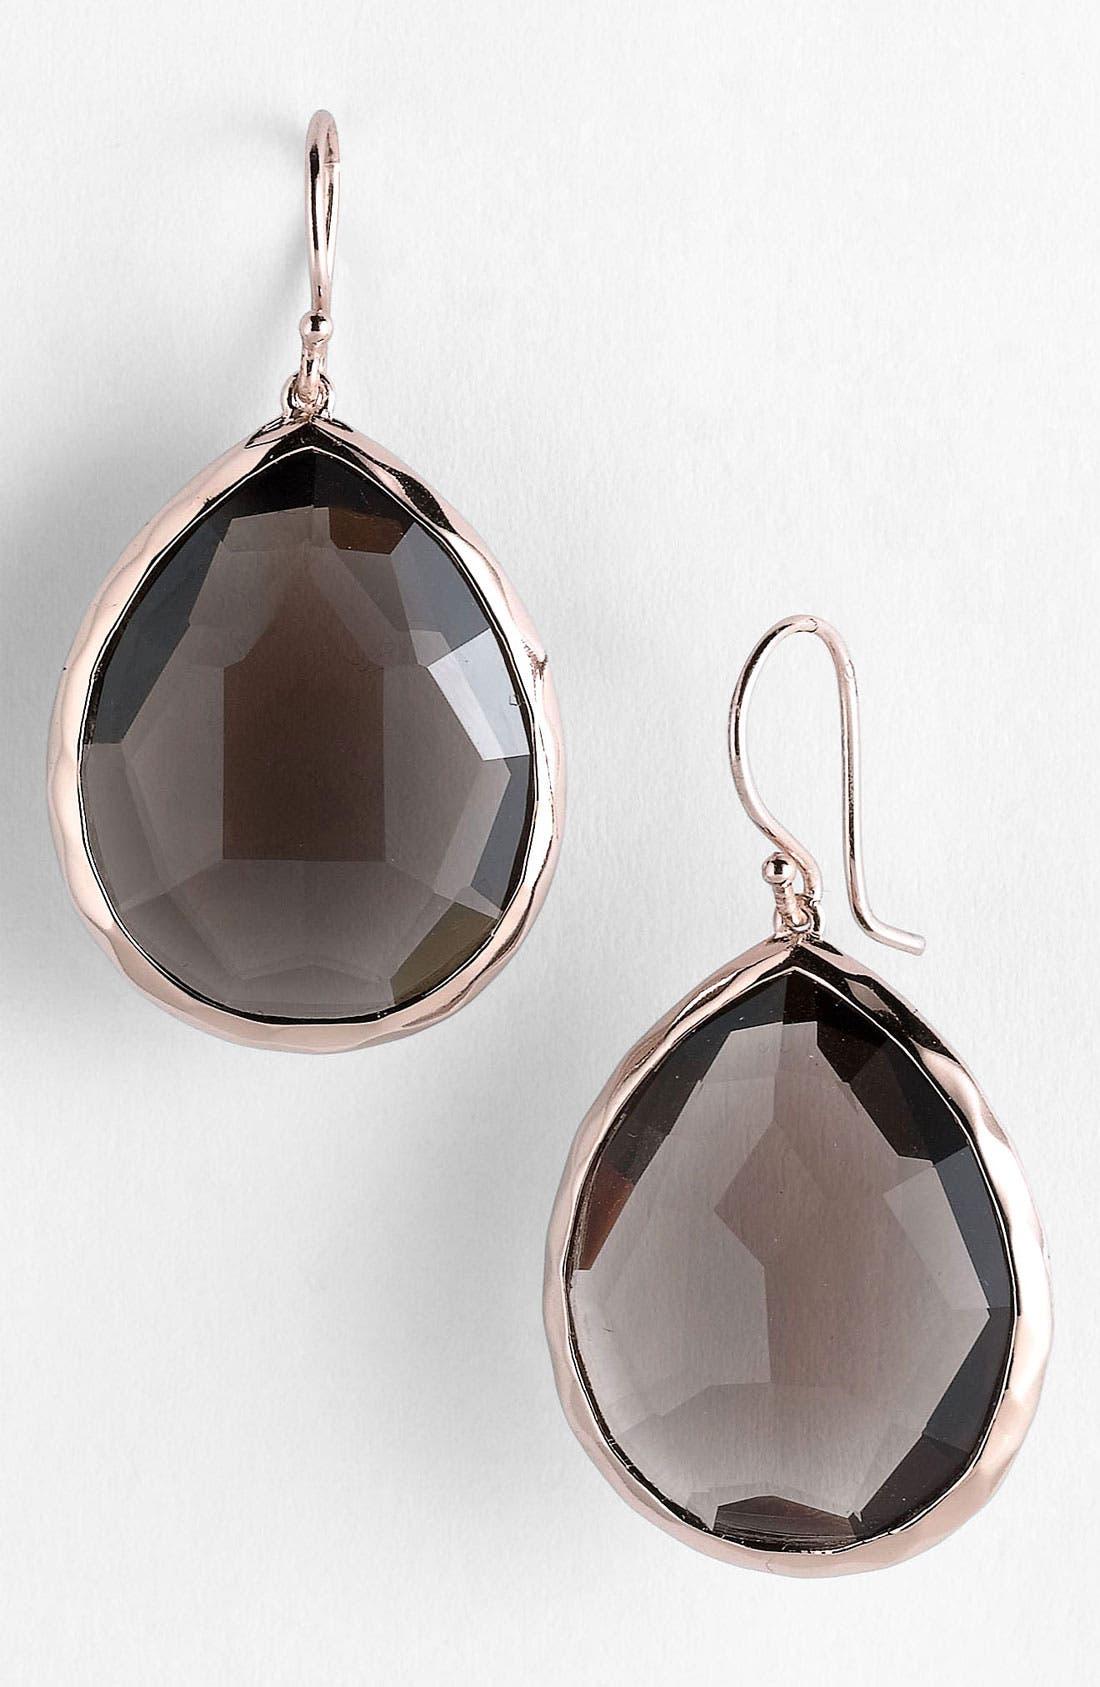 Alternate Image 1 Selected - Ippolita 'Rock Candy' Rosé Large Teardrop Earrings